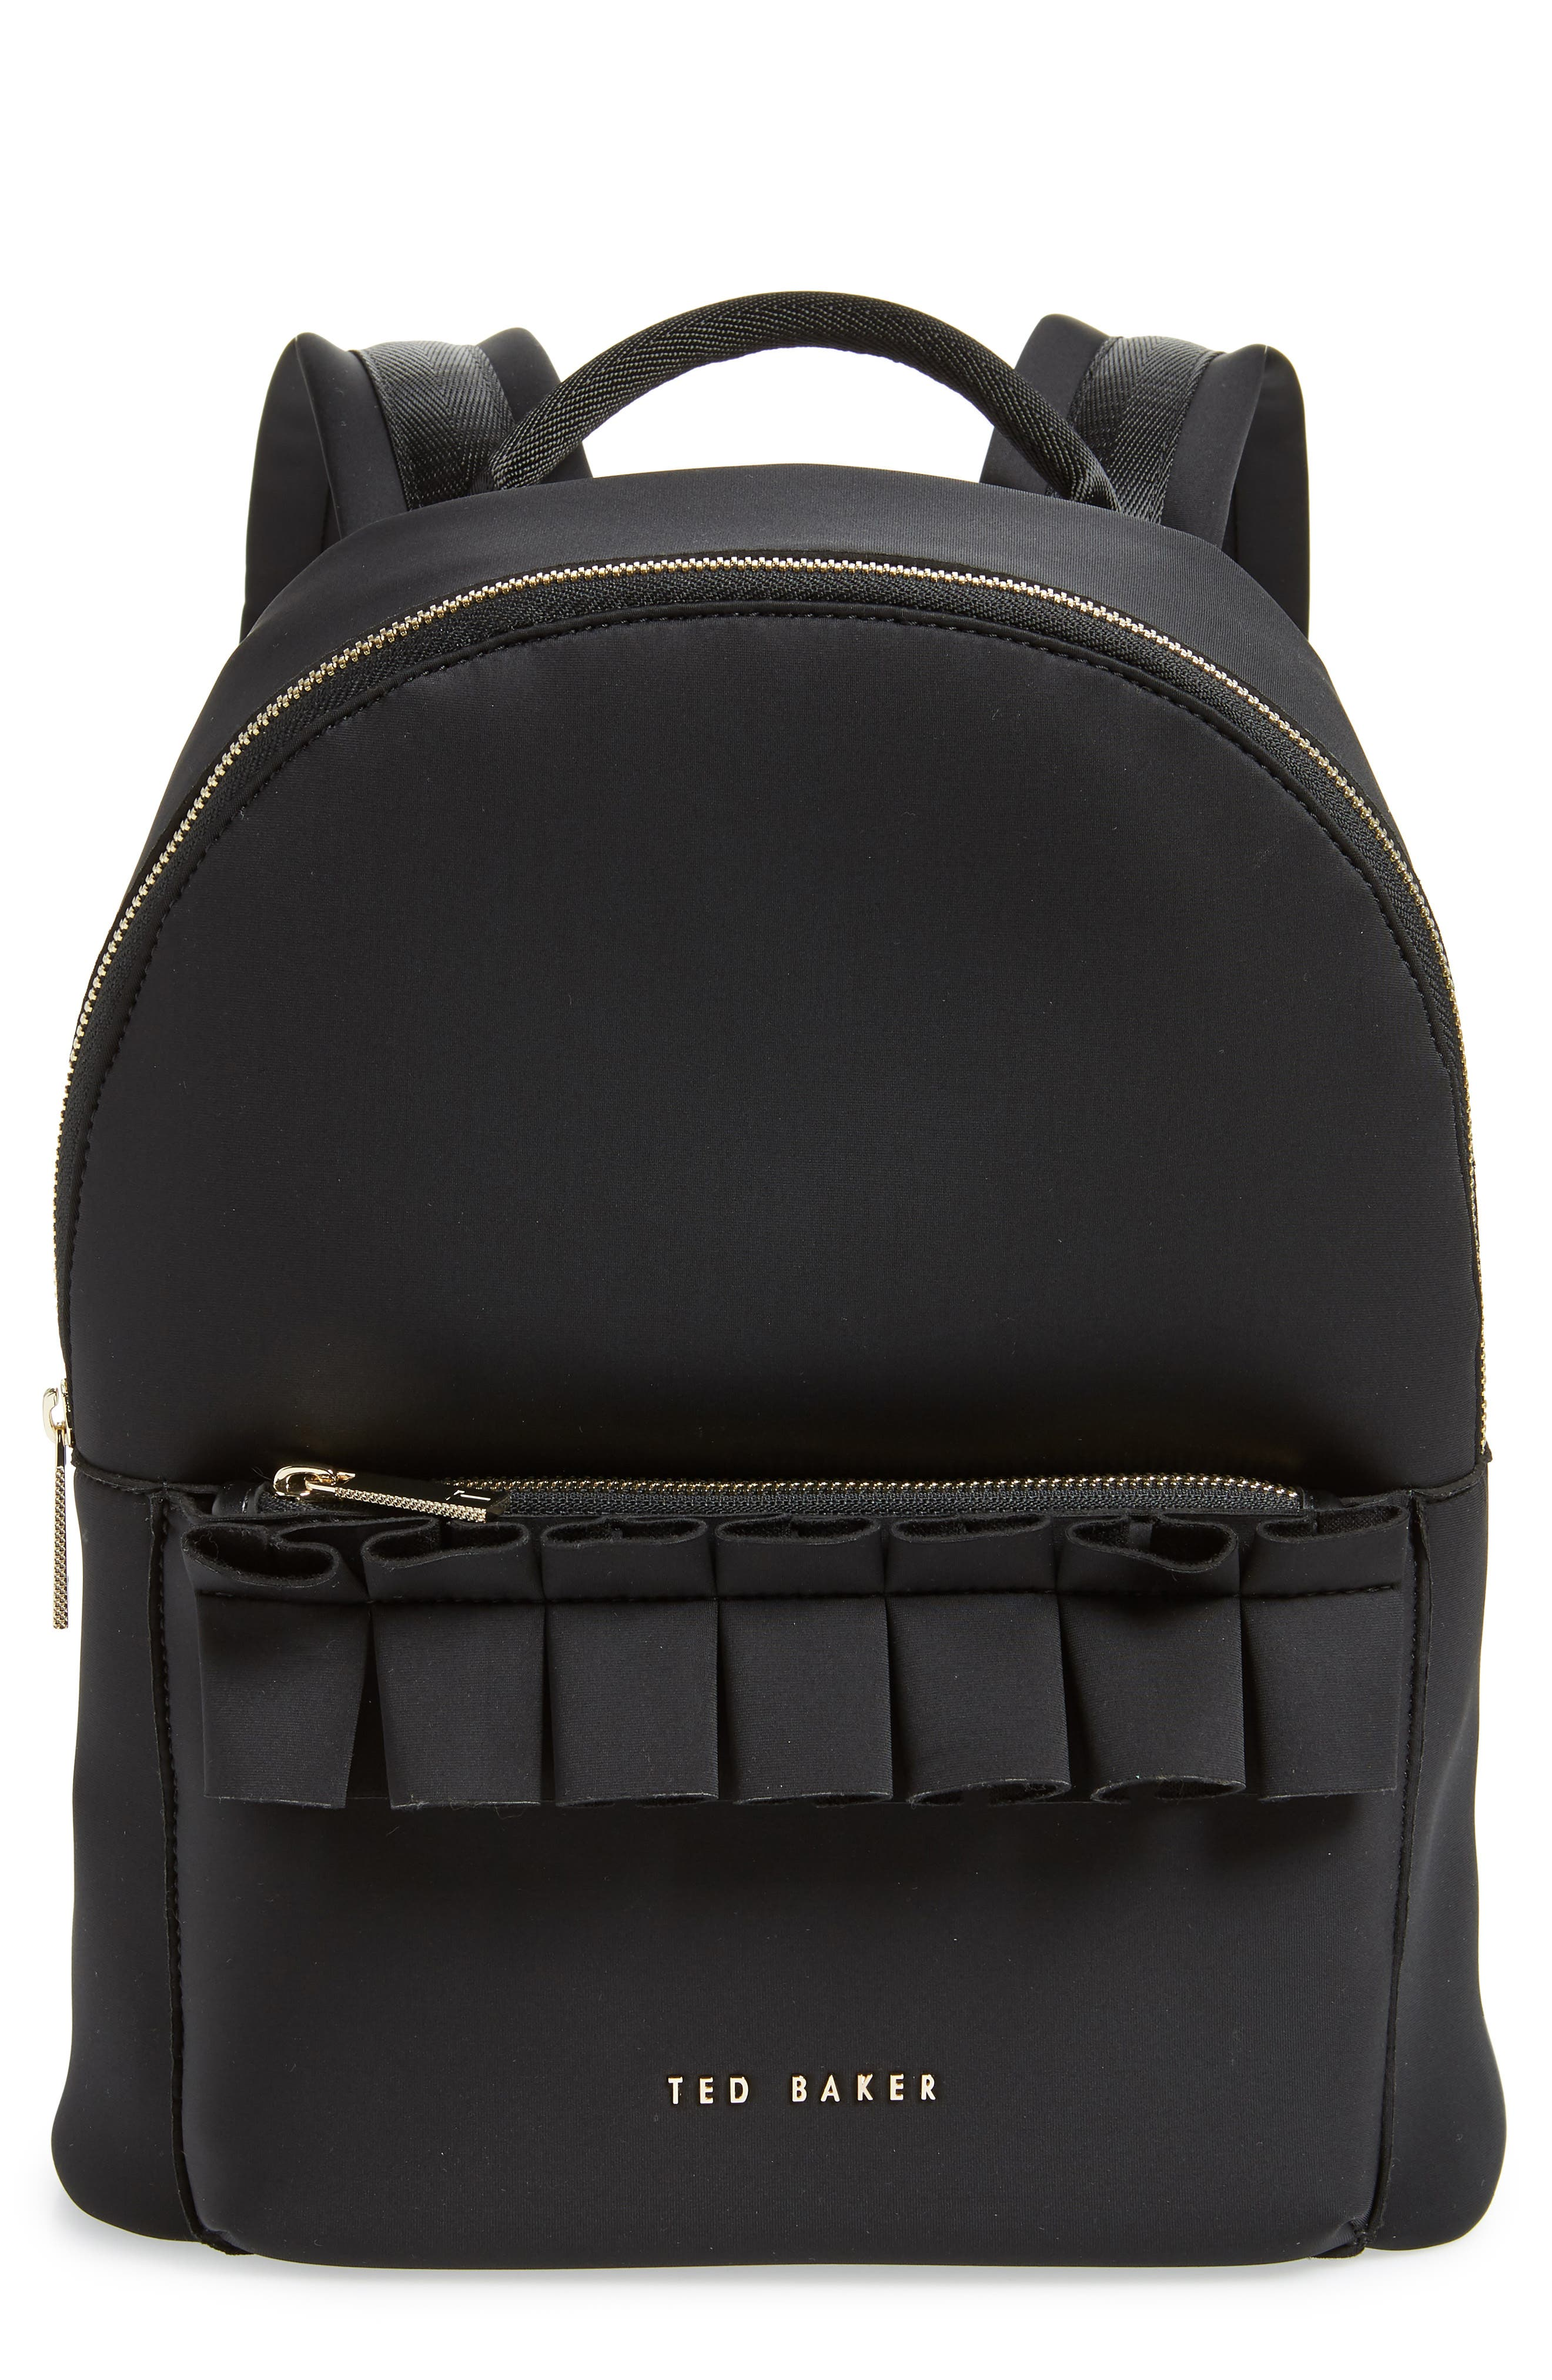 TED BAKER LONDON Rresse Ruffle Backpack, Main, color, 001